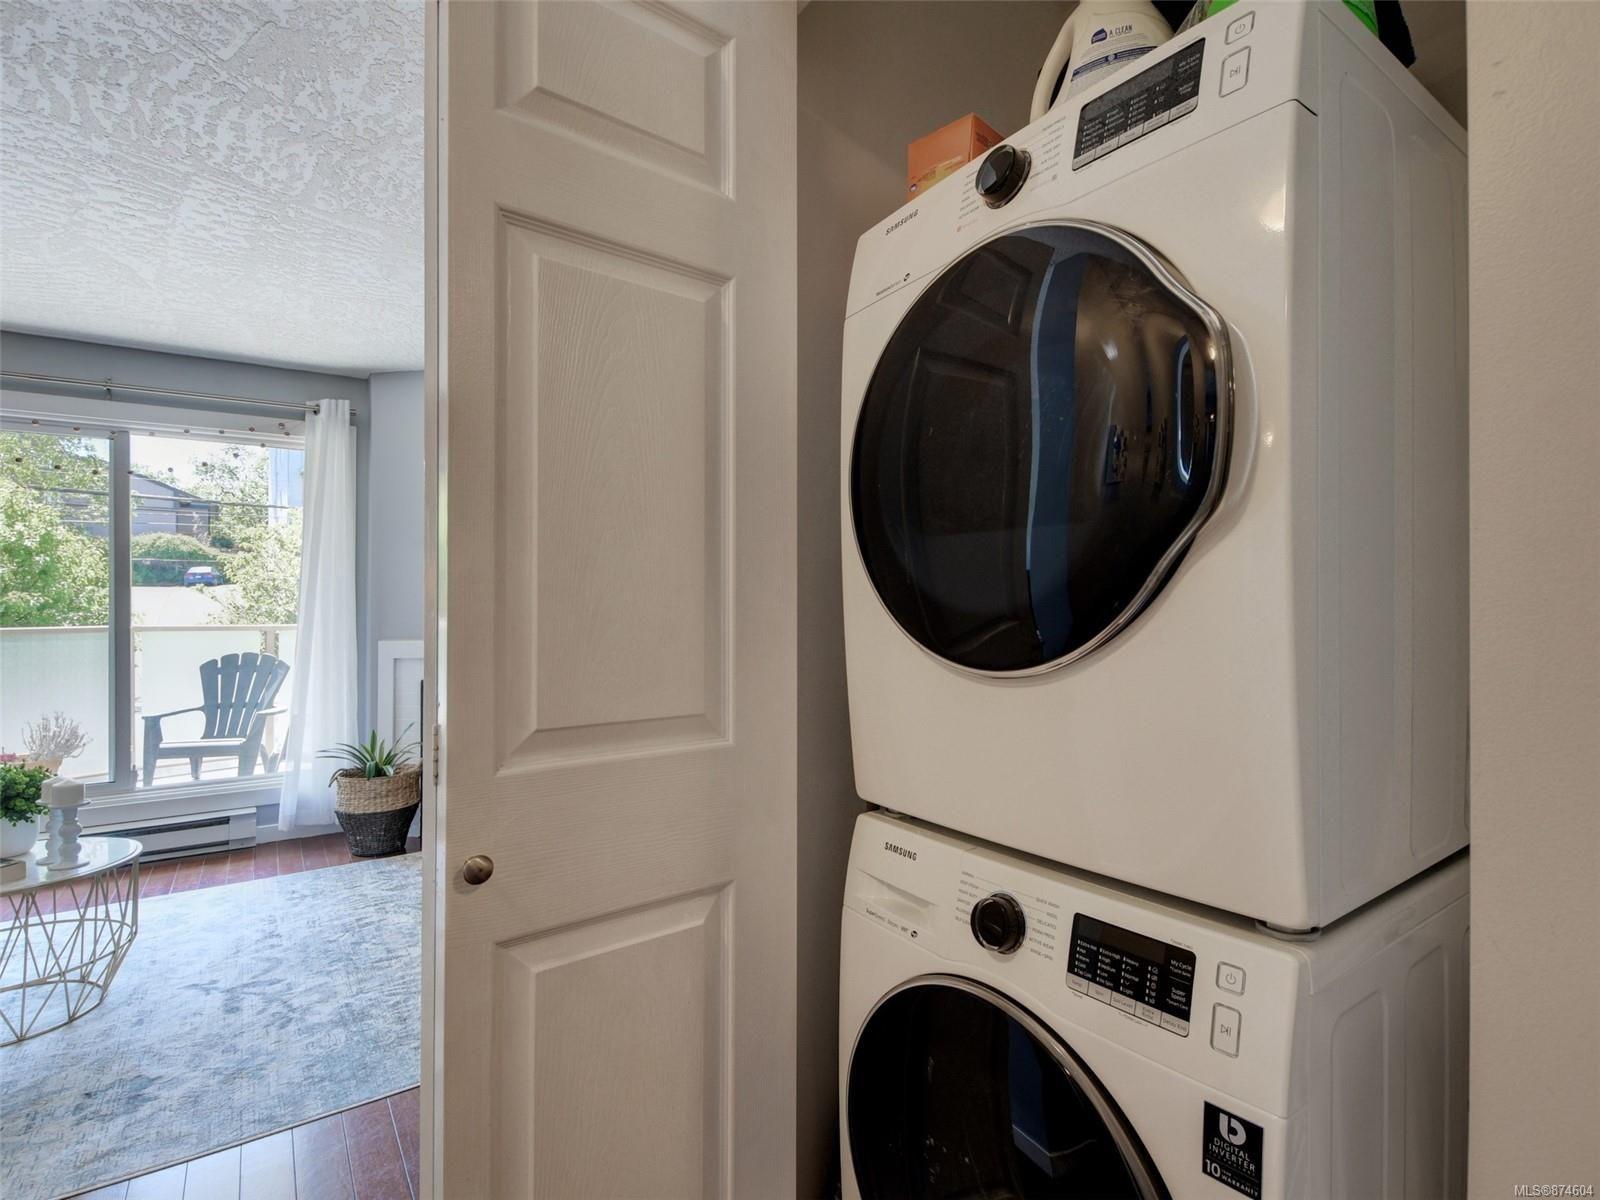 Photo 17: Photos: 202 2710 Grosvenor Rd in : Vi Oaklands Condo for sale (Victoria)  : MLS®# 874604